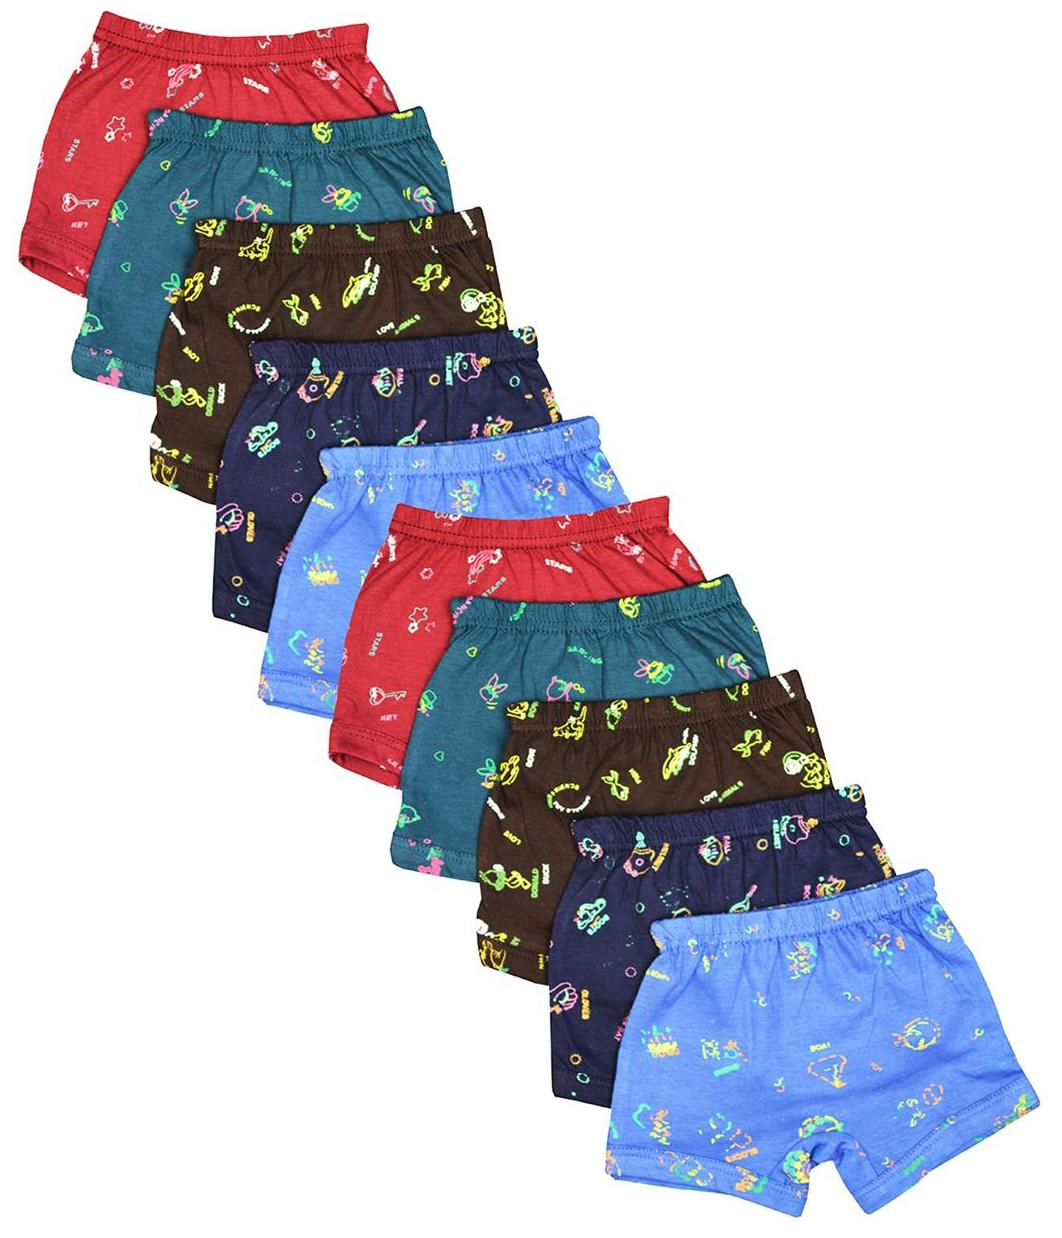 Elk Kids Baby Printed Panty Trouser Bloomer Innerwear 10 Piece Combo